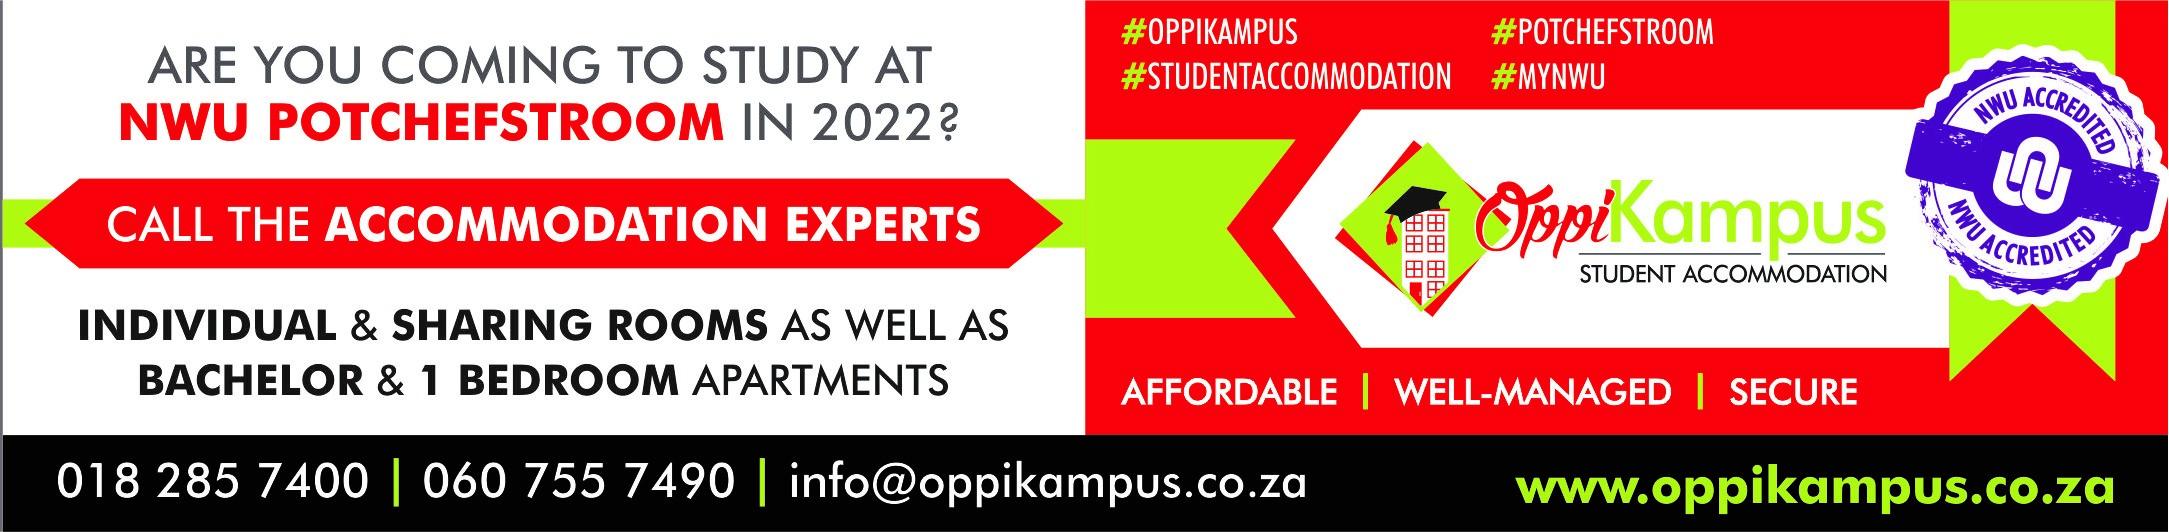 Advertisement:   OppiKampus student accommodation